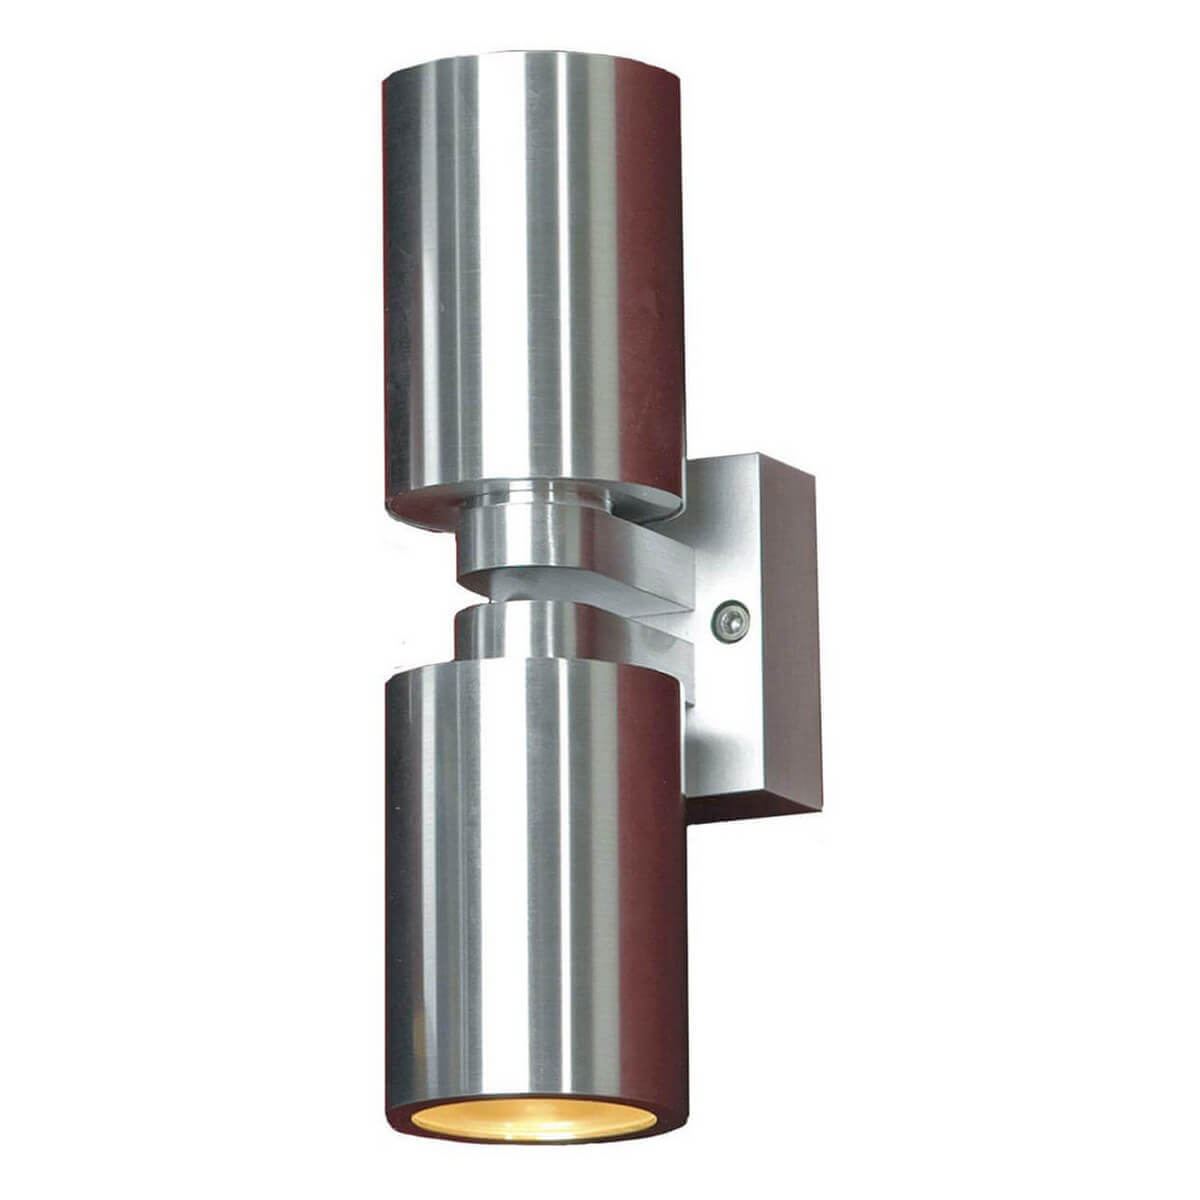 Светильник Lussole GRLSQ-9501-02 Vacri комплектующие для раковин cobbe 9501